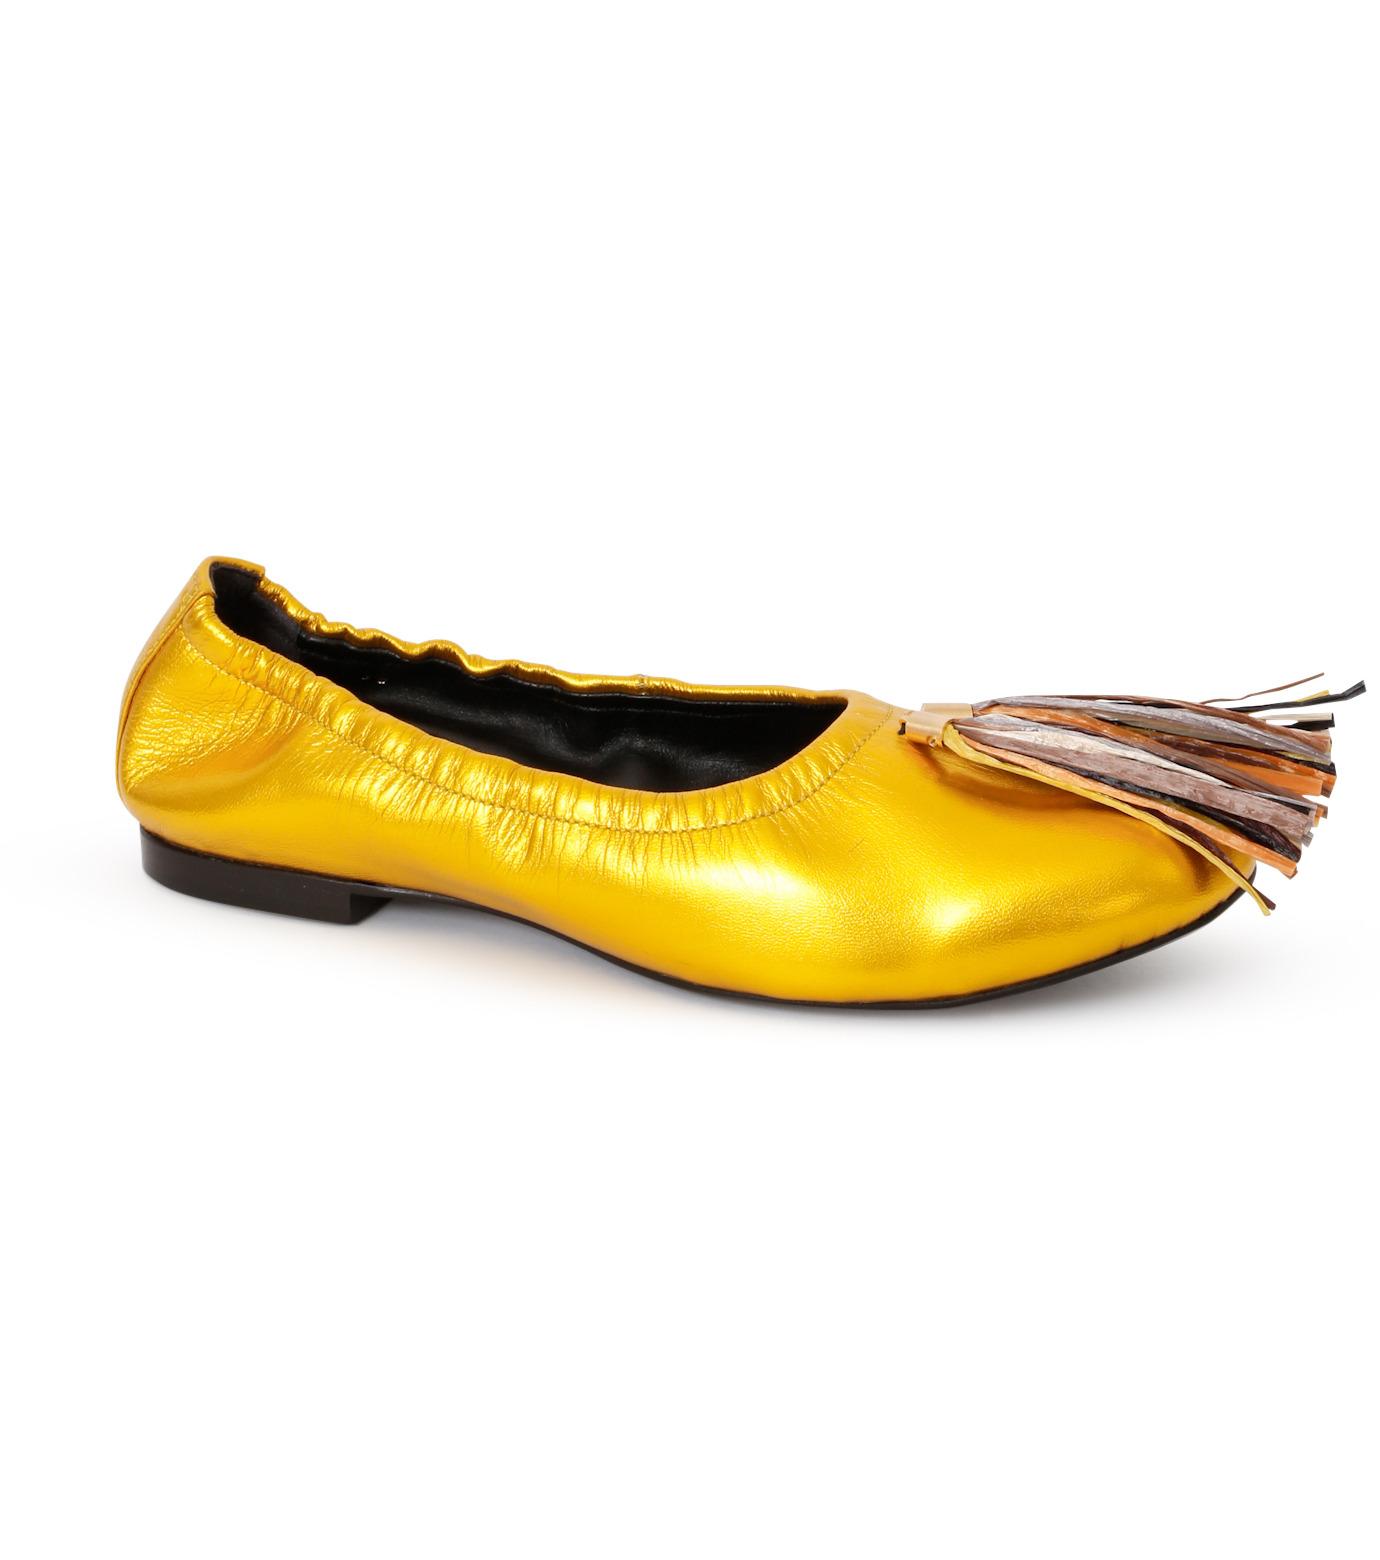 PIPPICHIC(ピッピシック)のballet shoes-GOLD(シューズ/shoes)-PP16BALLET19-2 拡大詳細画像1